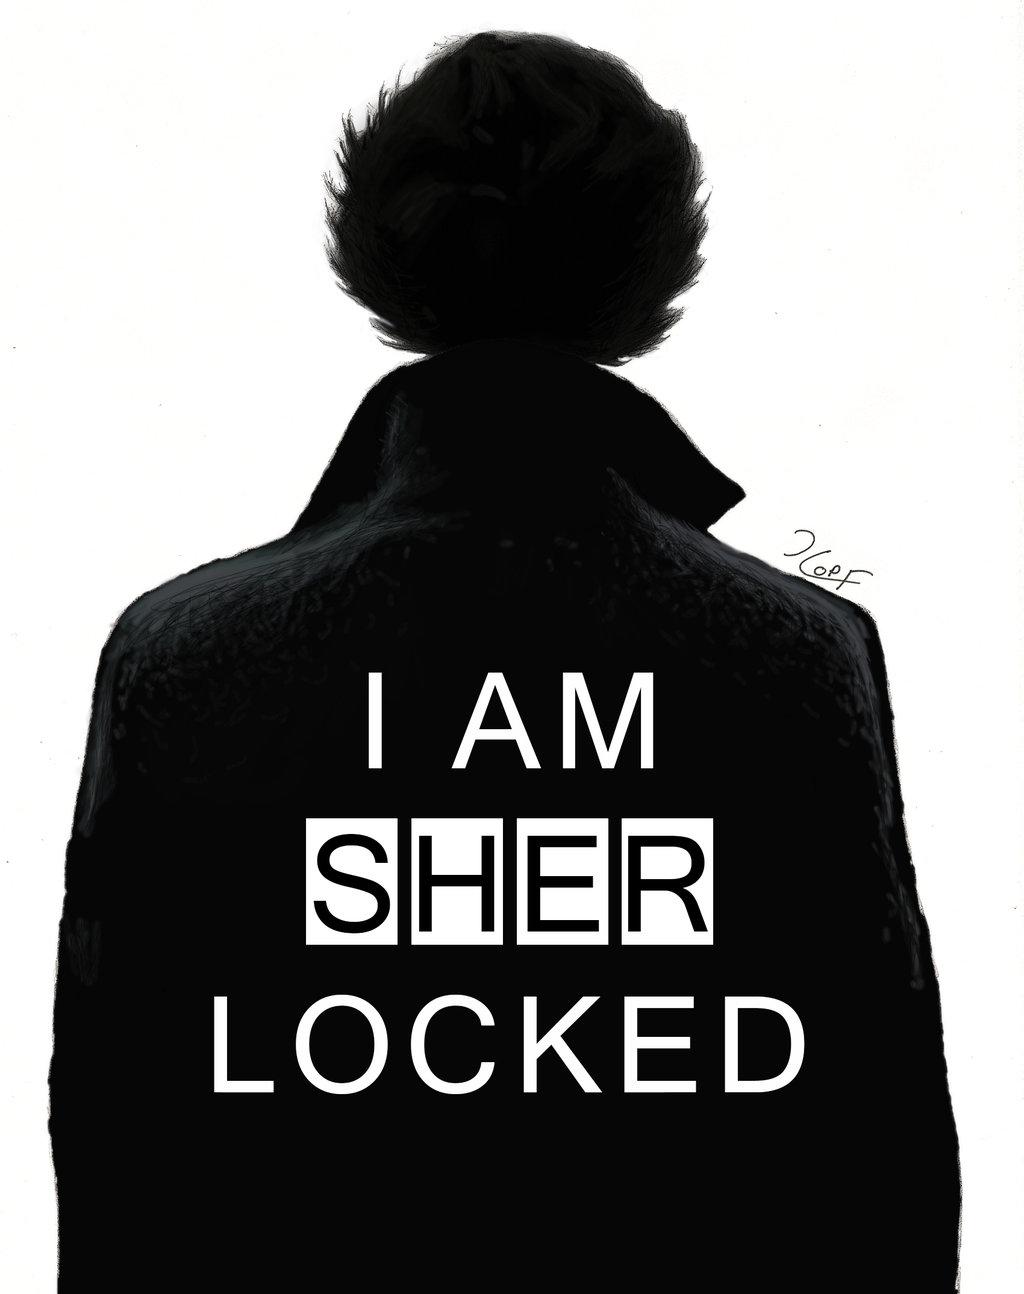 I AM Sherlocked Wallpaper - WallpaperSafari